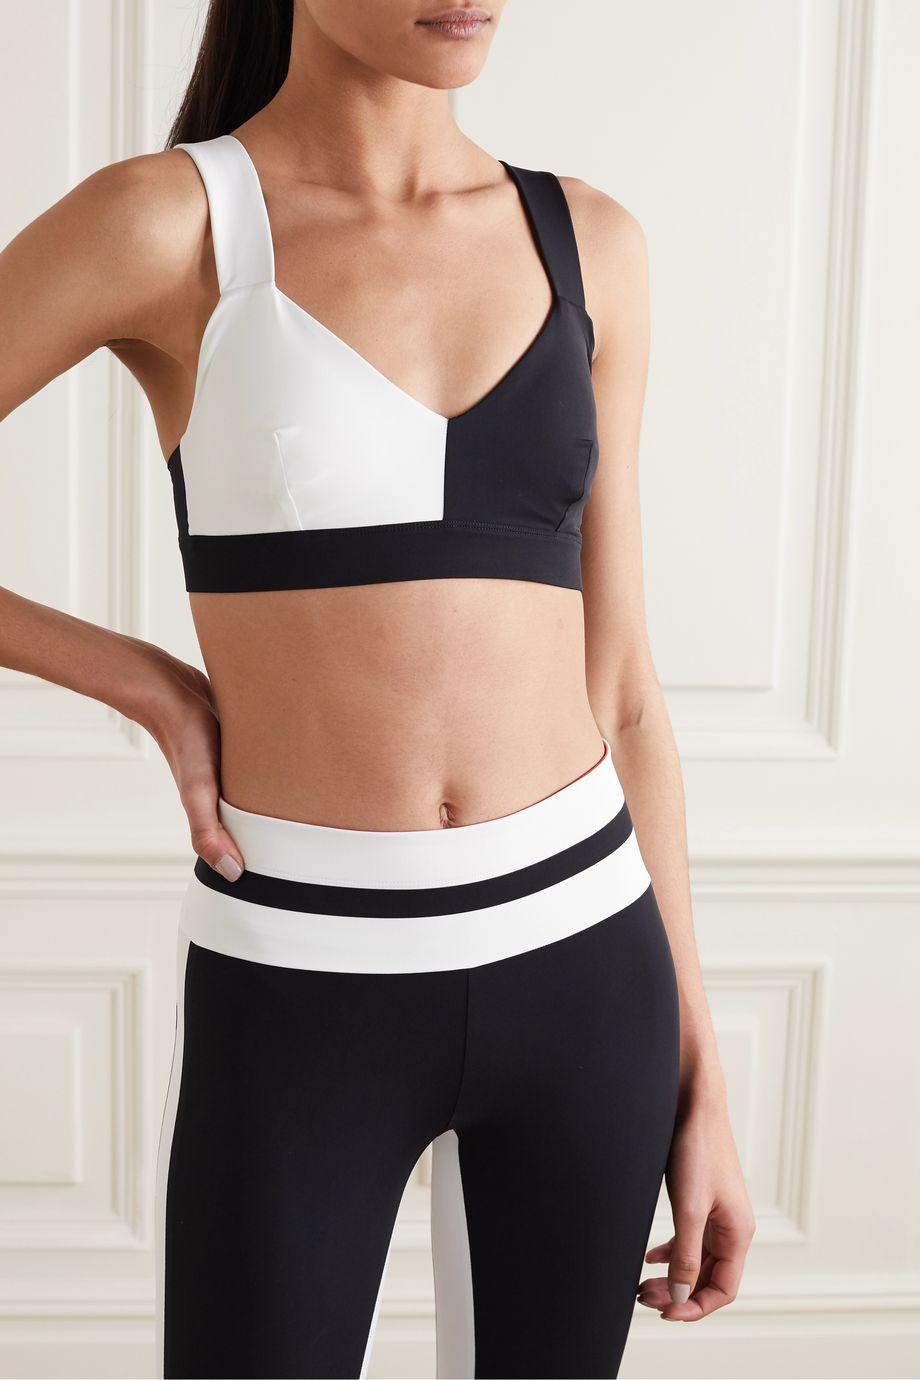 Vaara Elsa two-tone stretch sports bra